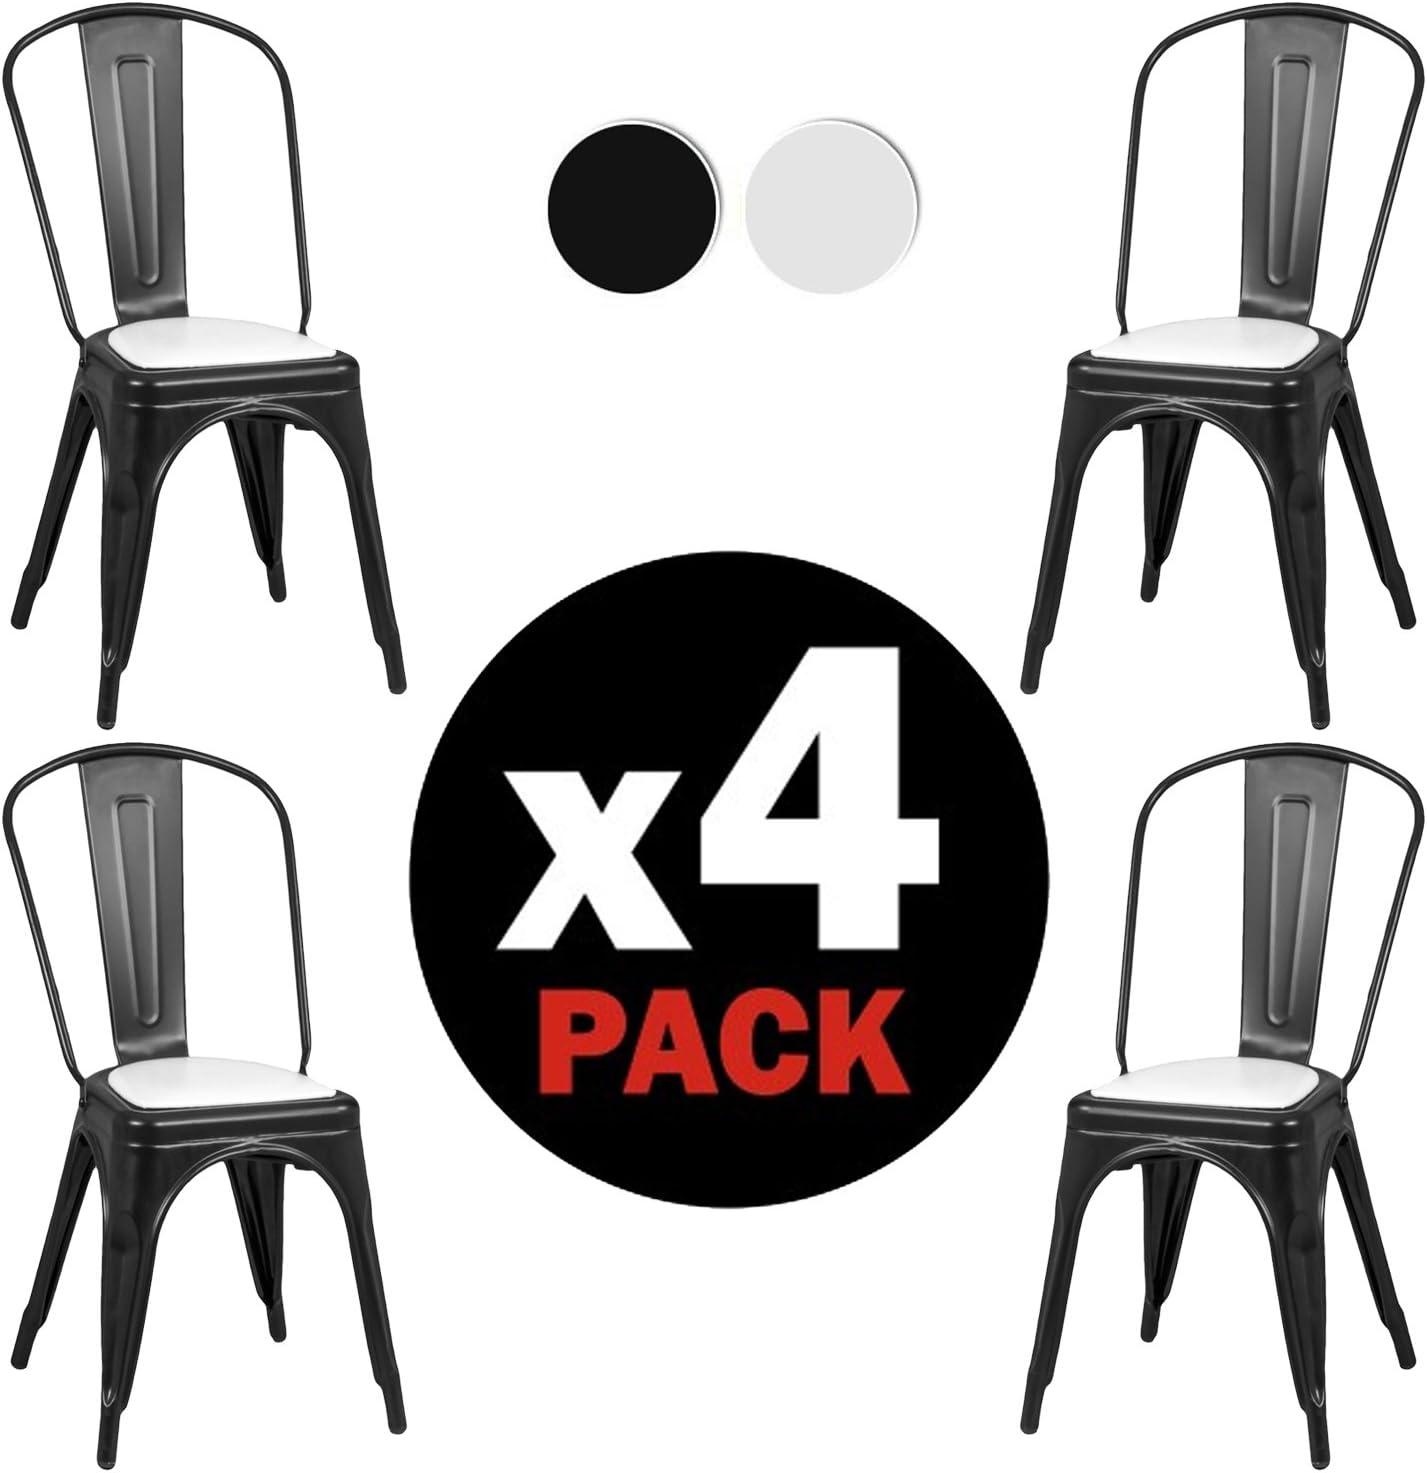 Due-Home - Pack 4 sillas Replica Tolix, Estructura Metalica Color Negro Mate, Medidas: 46,5 cm (Ancho) x 84 cm (Alto) x 52,2 cm (Fondo).: Amazon.es: Hogar